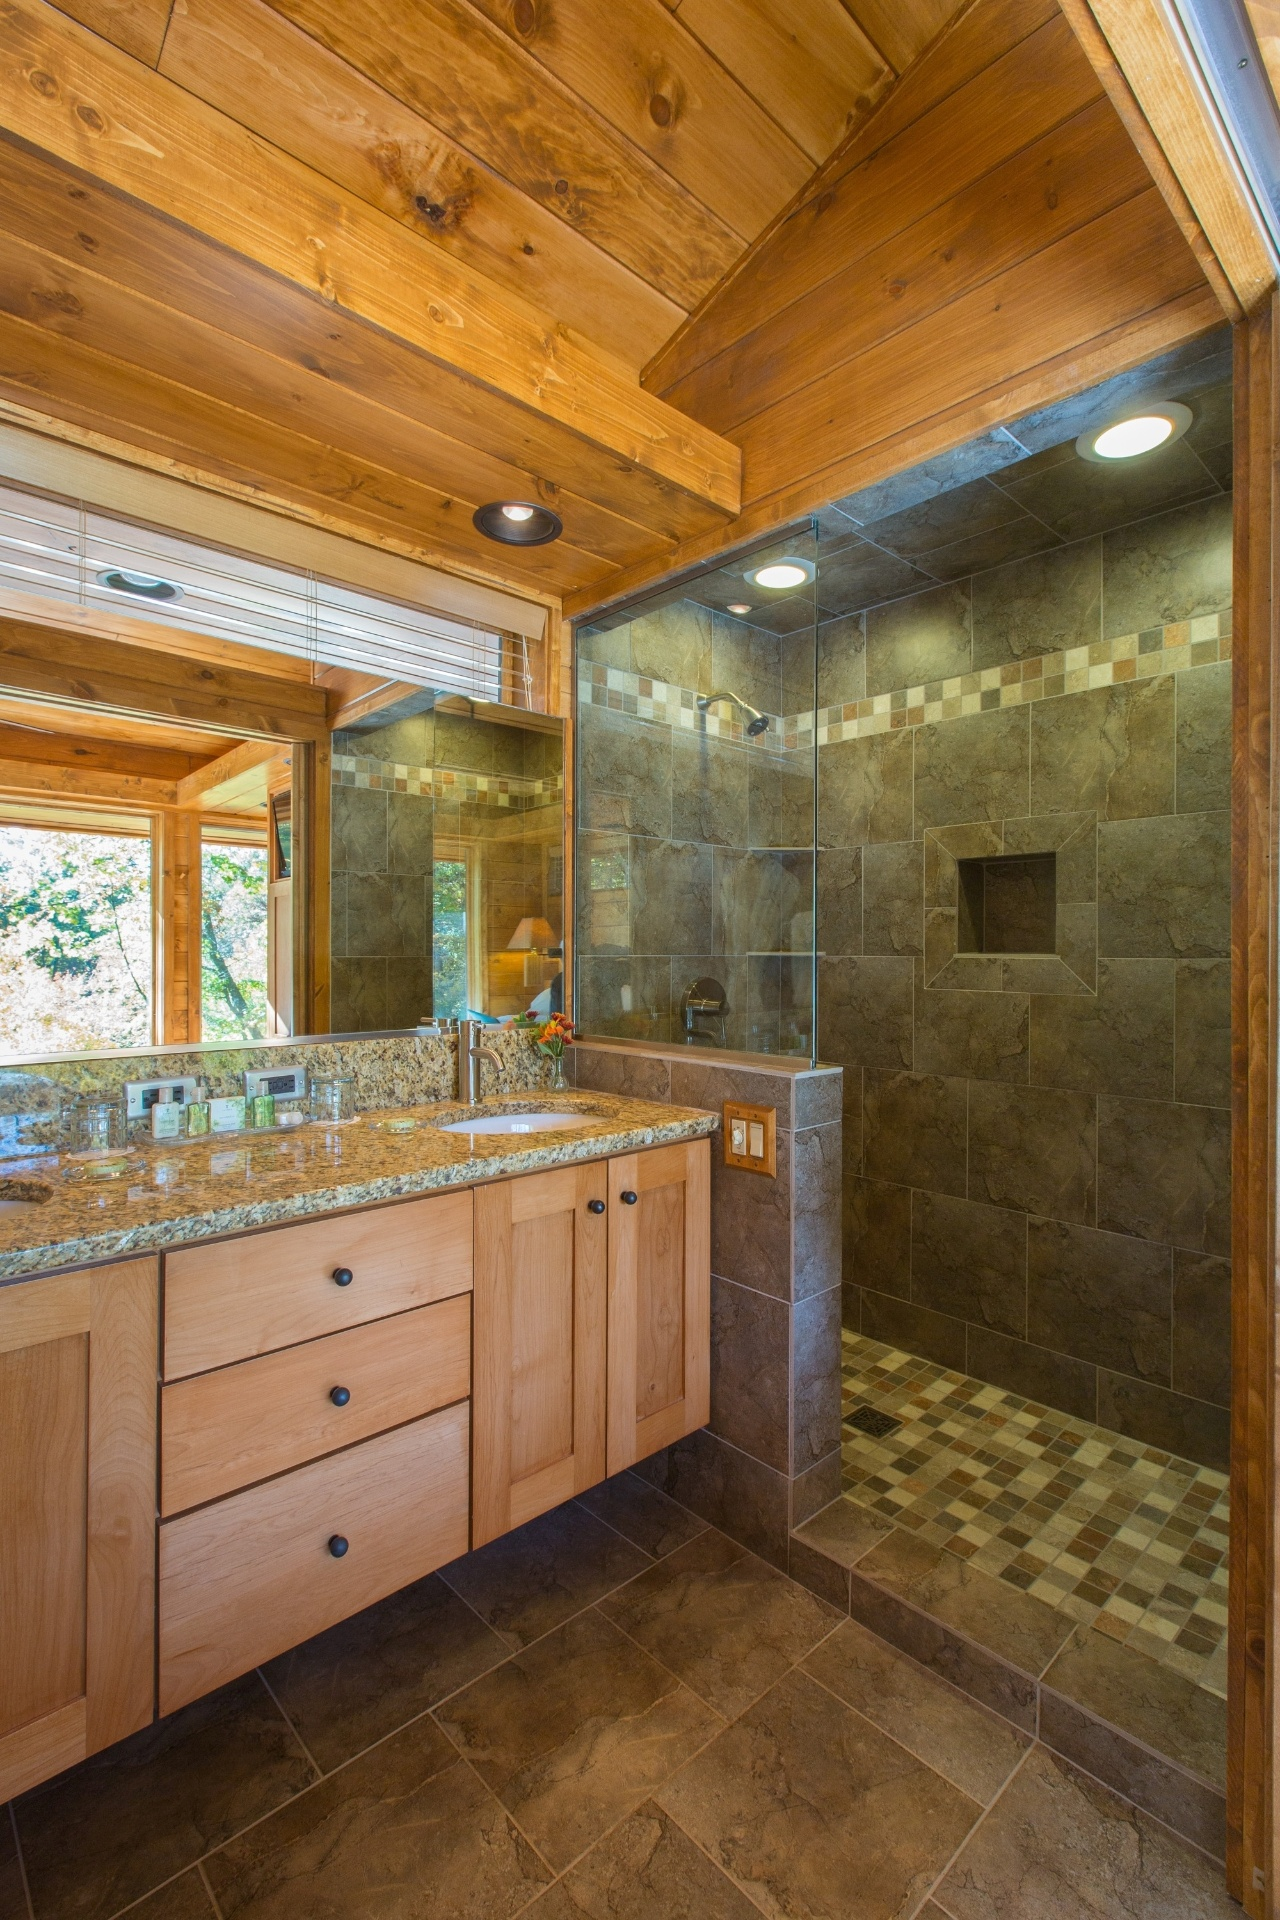 O banheiro da casa de campo